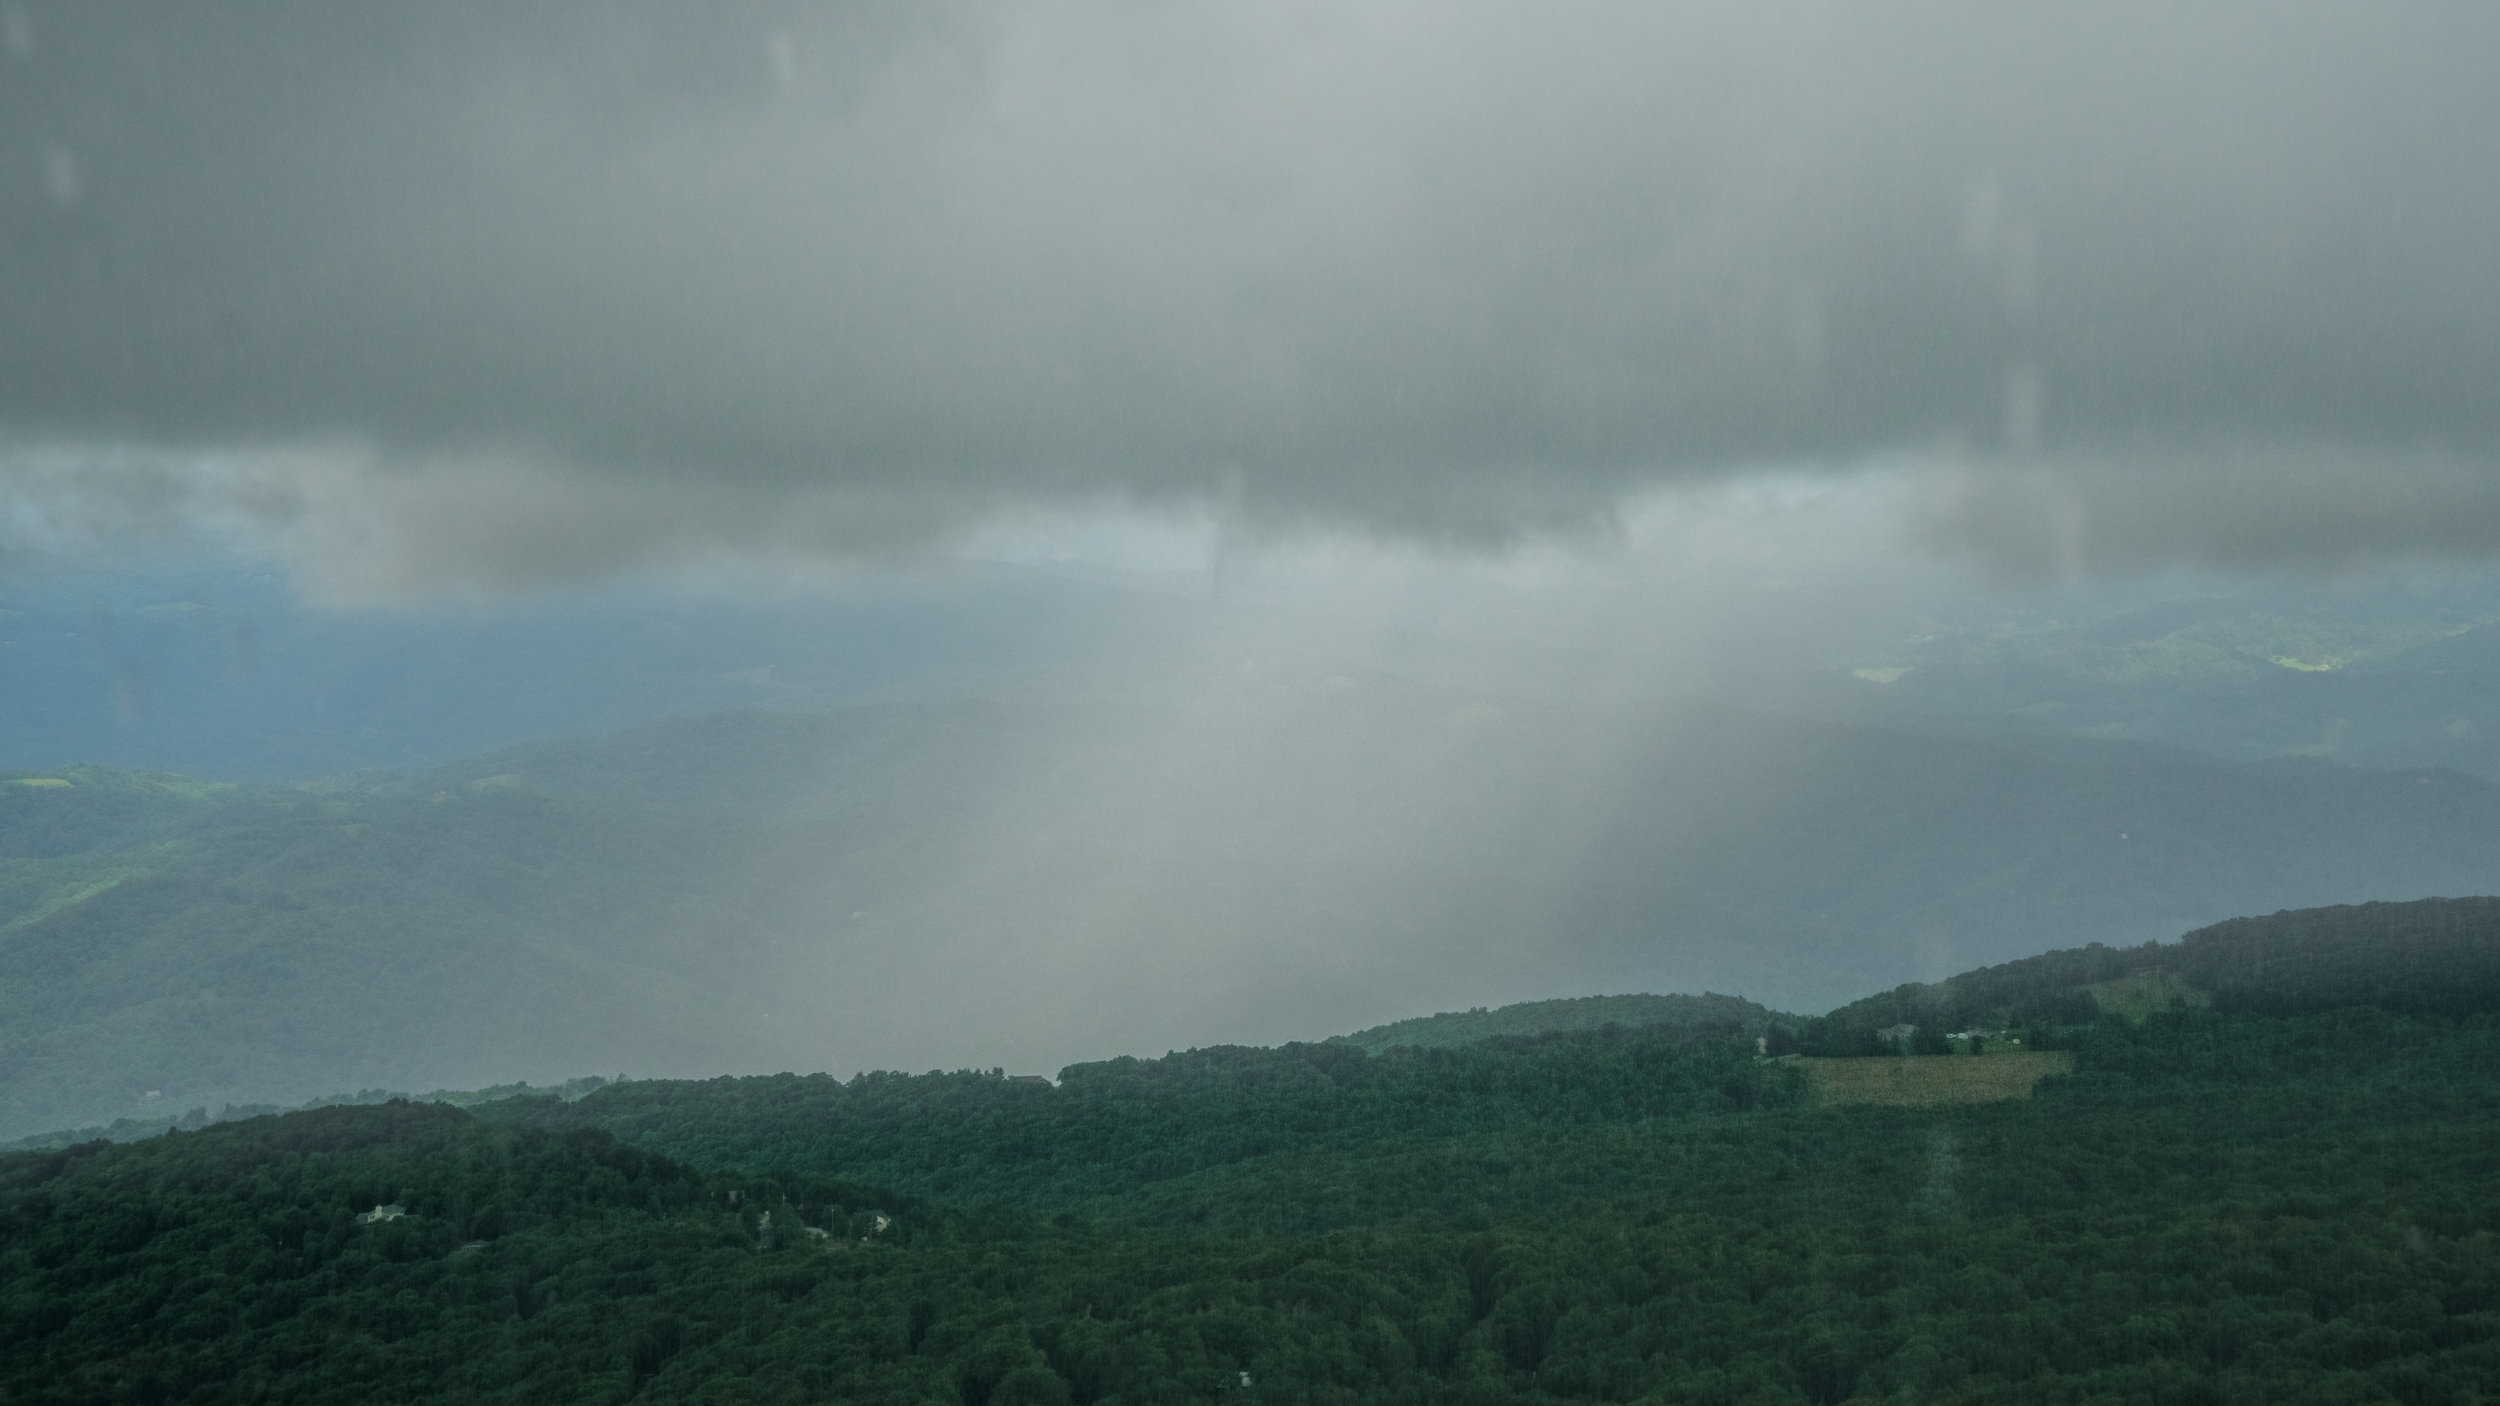 Mountain Rainstorm